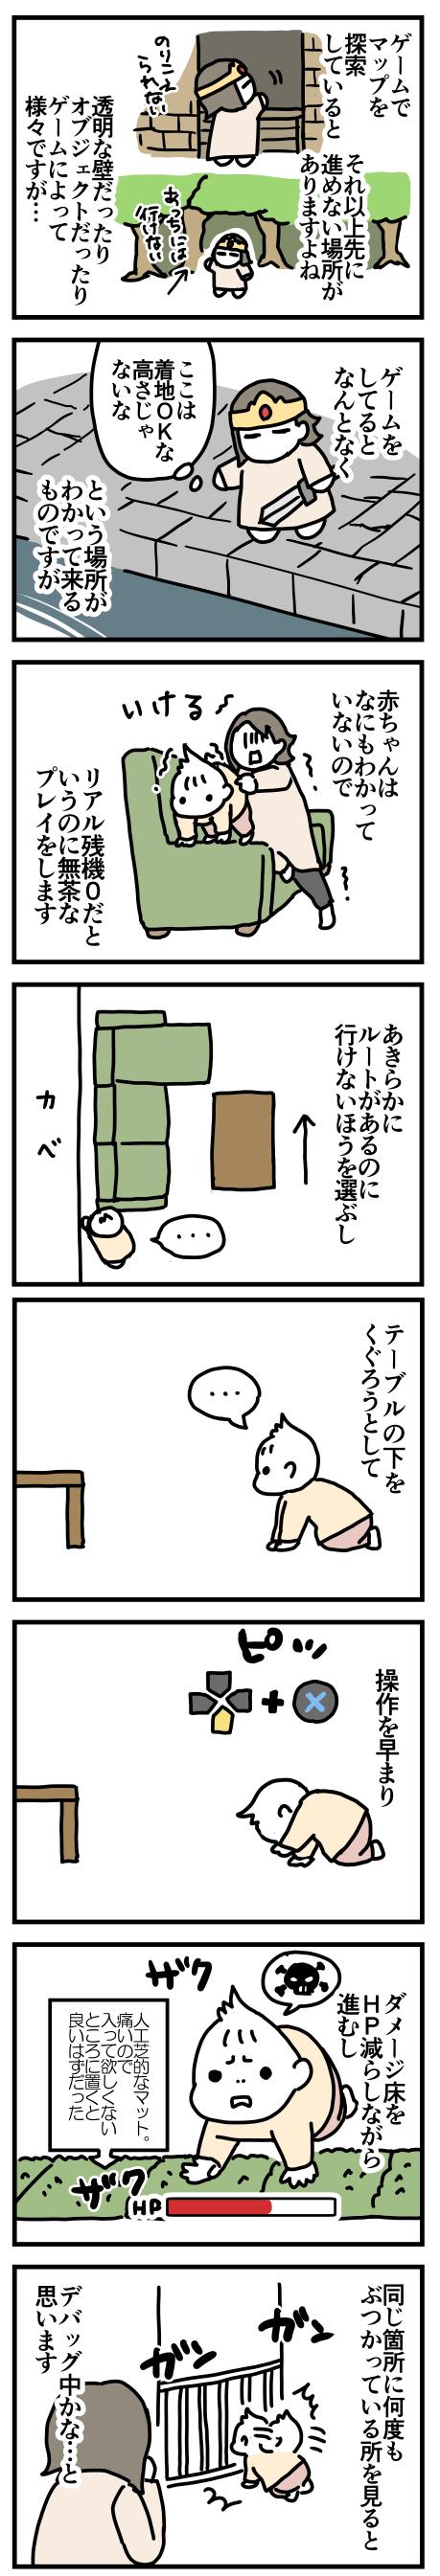 f:id:kanemotonomukuu:20170929141731j:plain